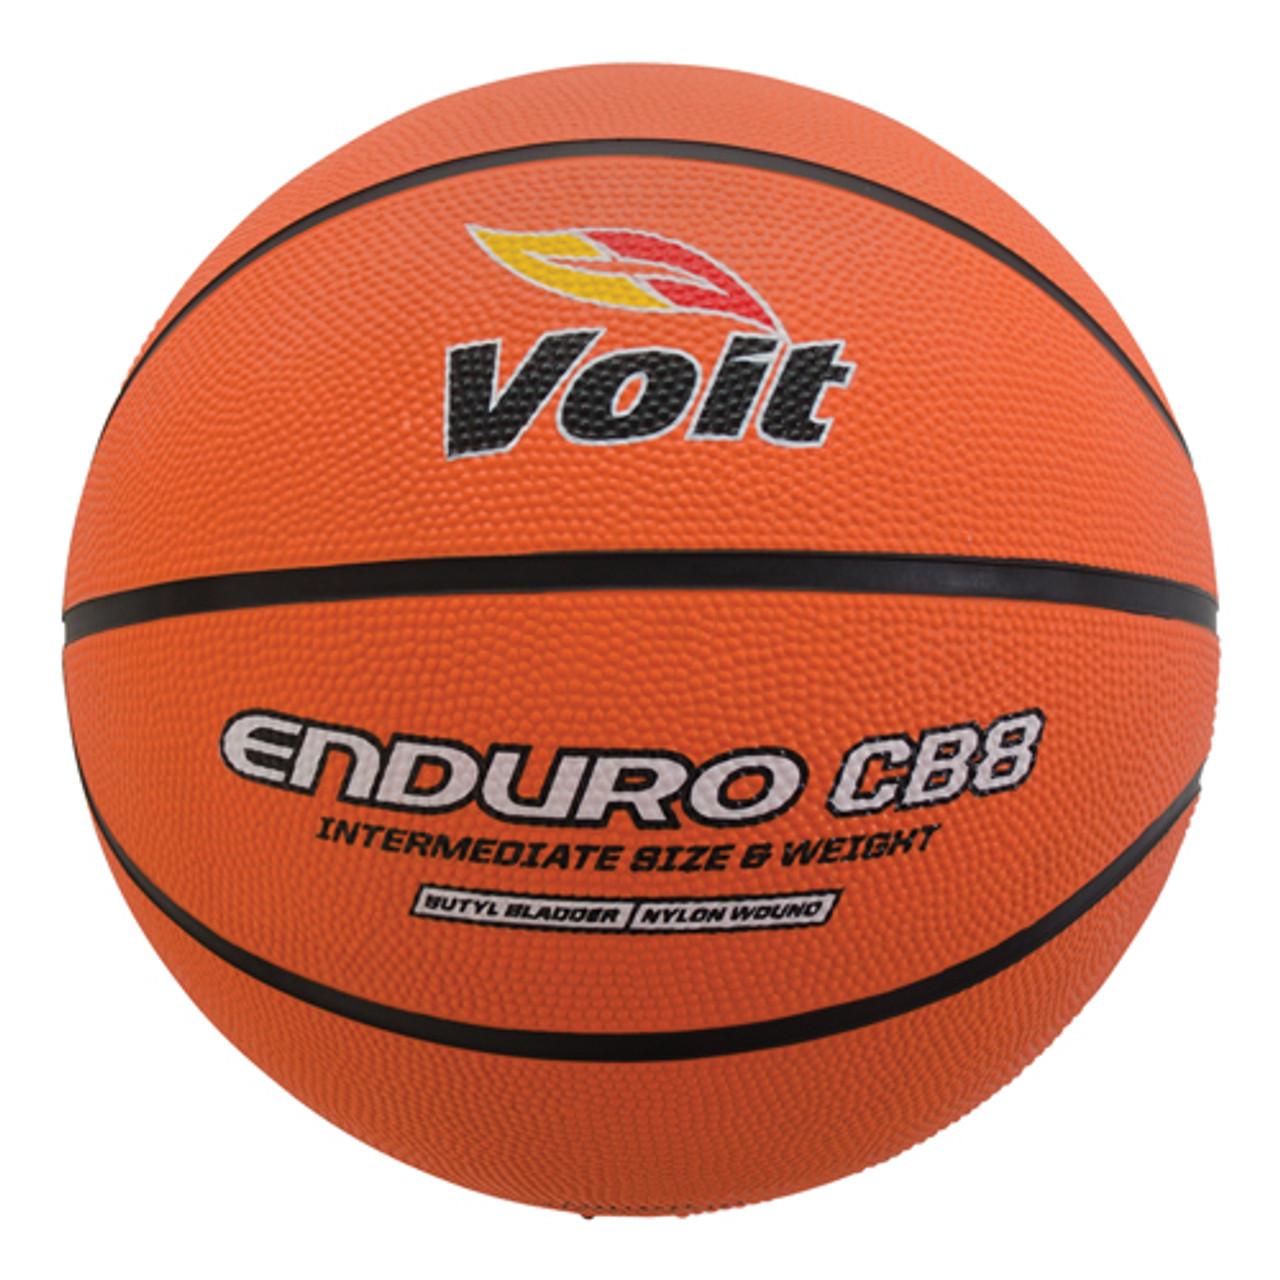 Voit Enduro Rubber Basketball